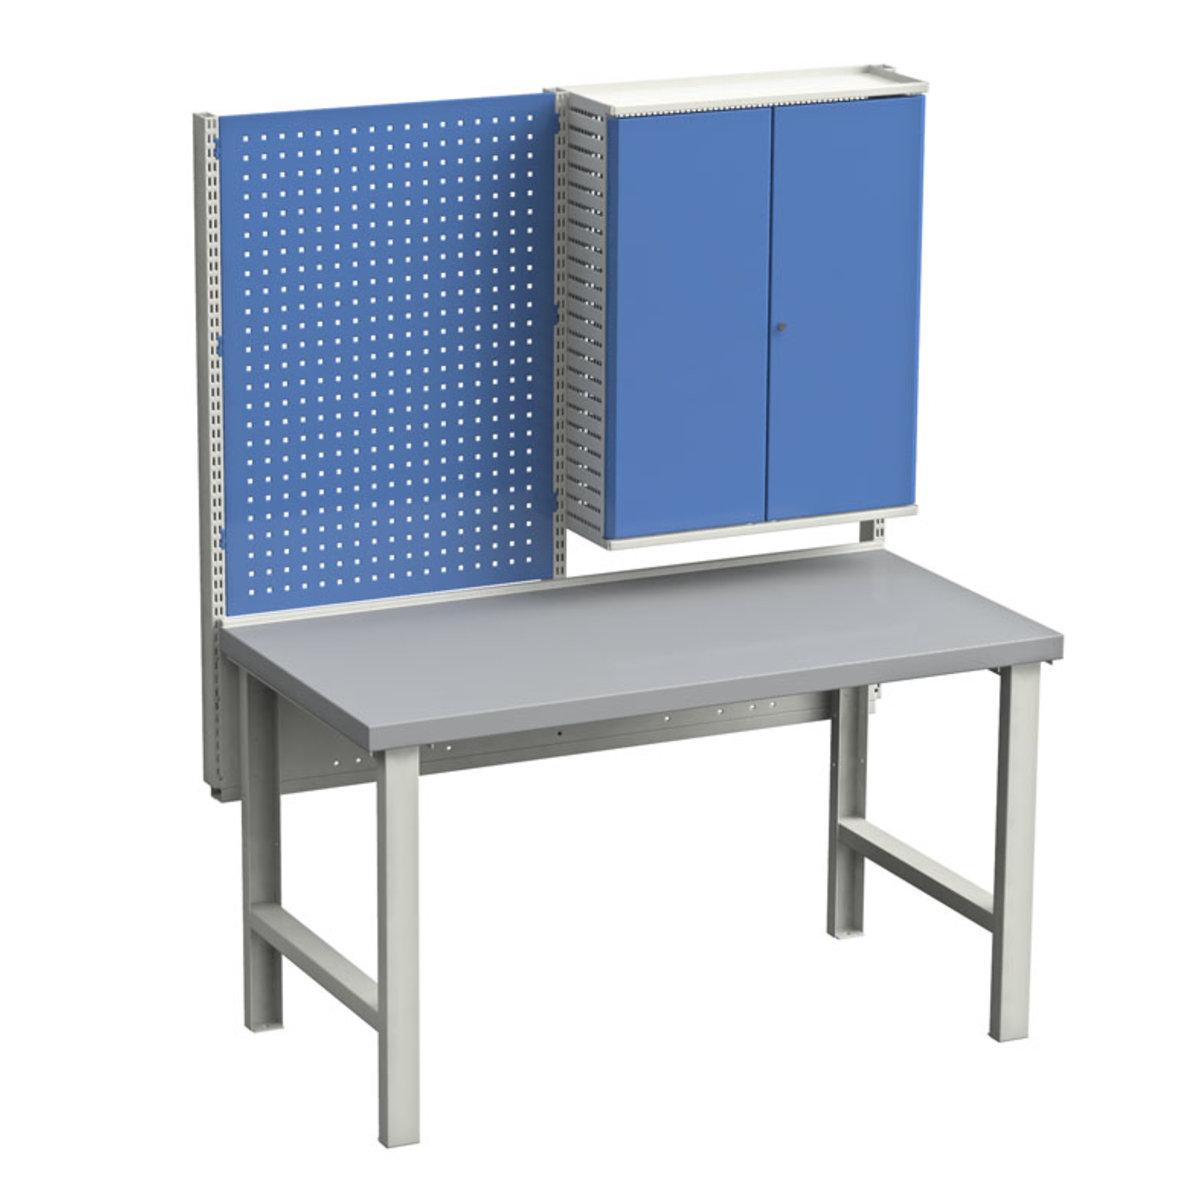 Workshop Workbench For Heavy Duty Uses Treston